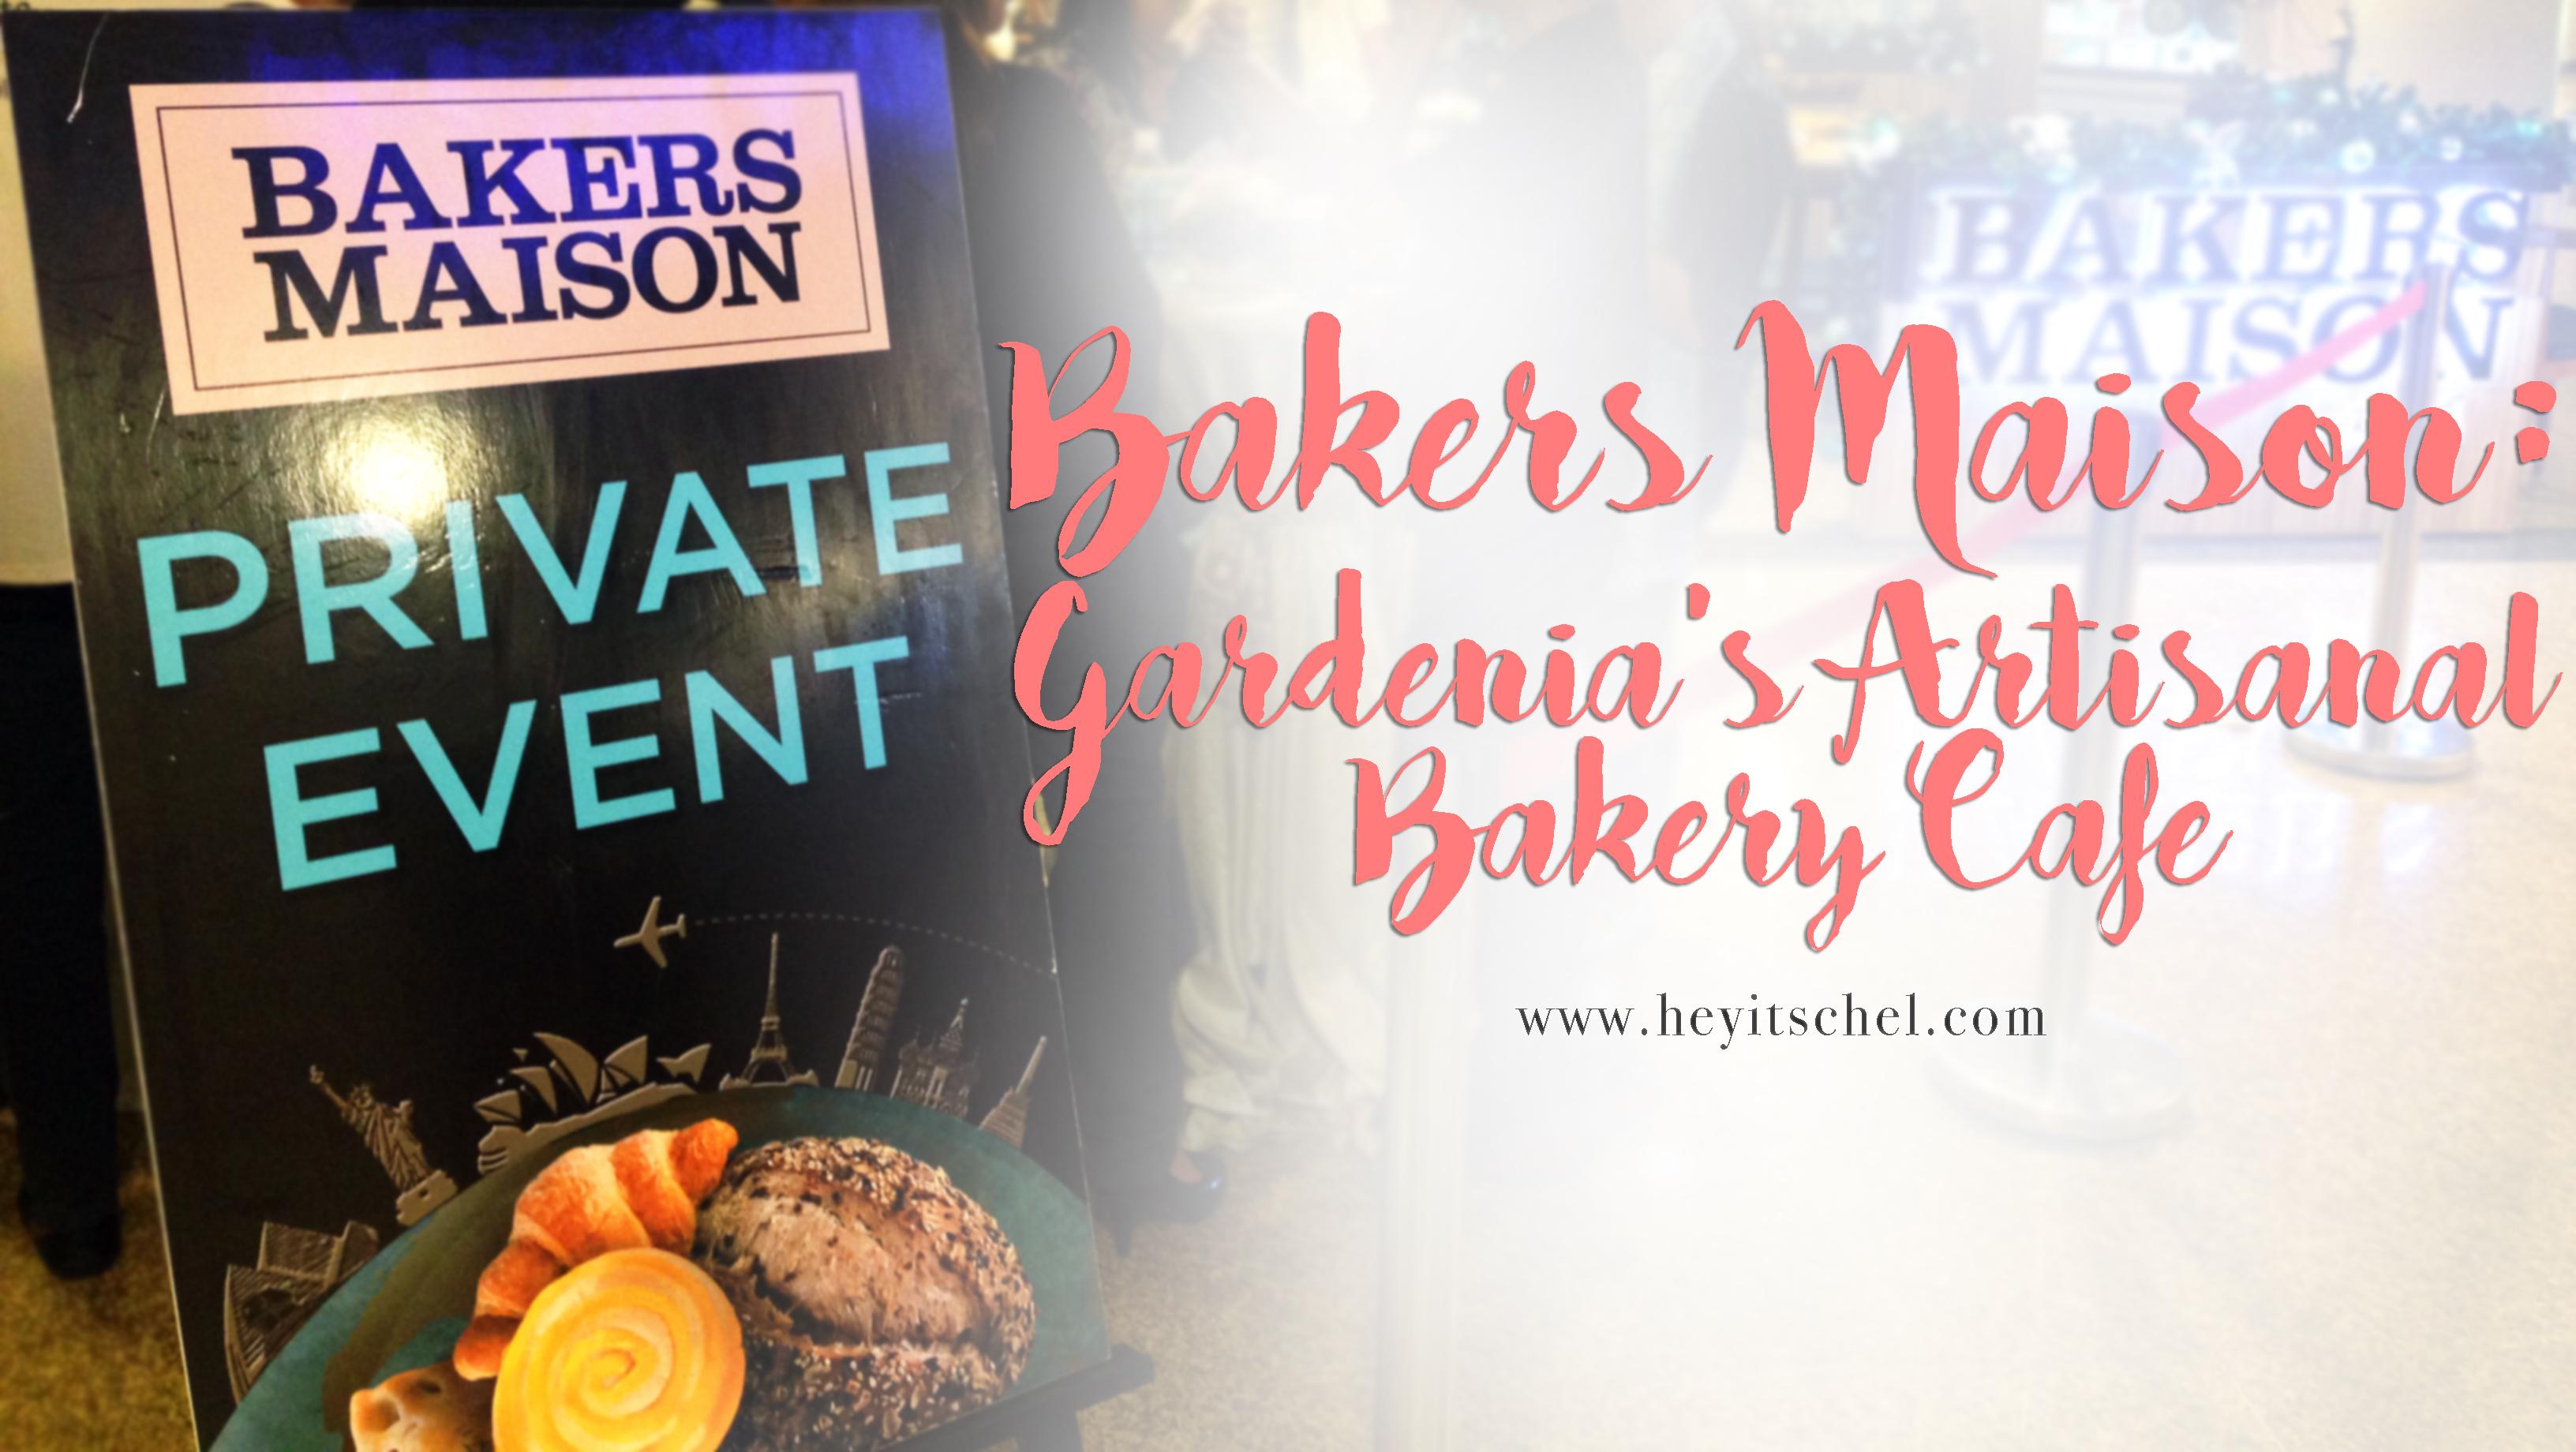 Bakers Maison: Gardenia's Artisanal Bakery Cafe